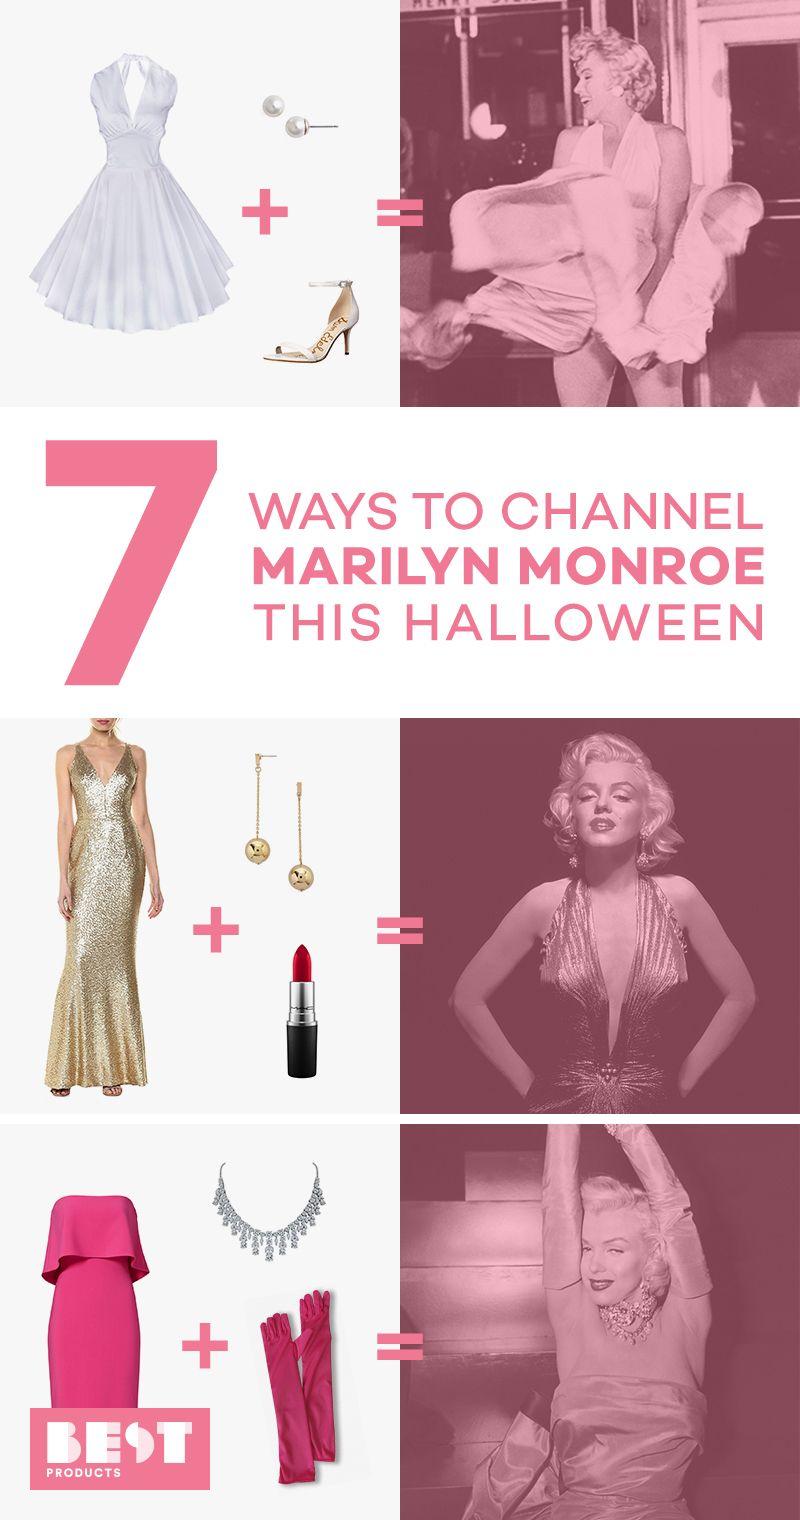 marilyn monroe halloween costumes best 2018  sc 1 st  BestProducts.com & 7 Best Marilyn Monroe Costumes for 2018 - DIY Marilyn Monroe ...